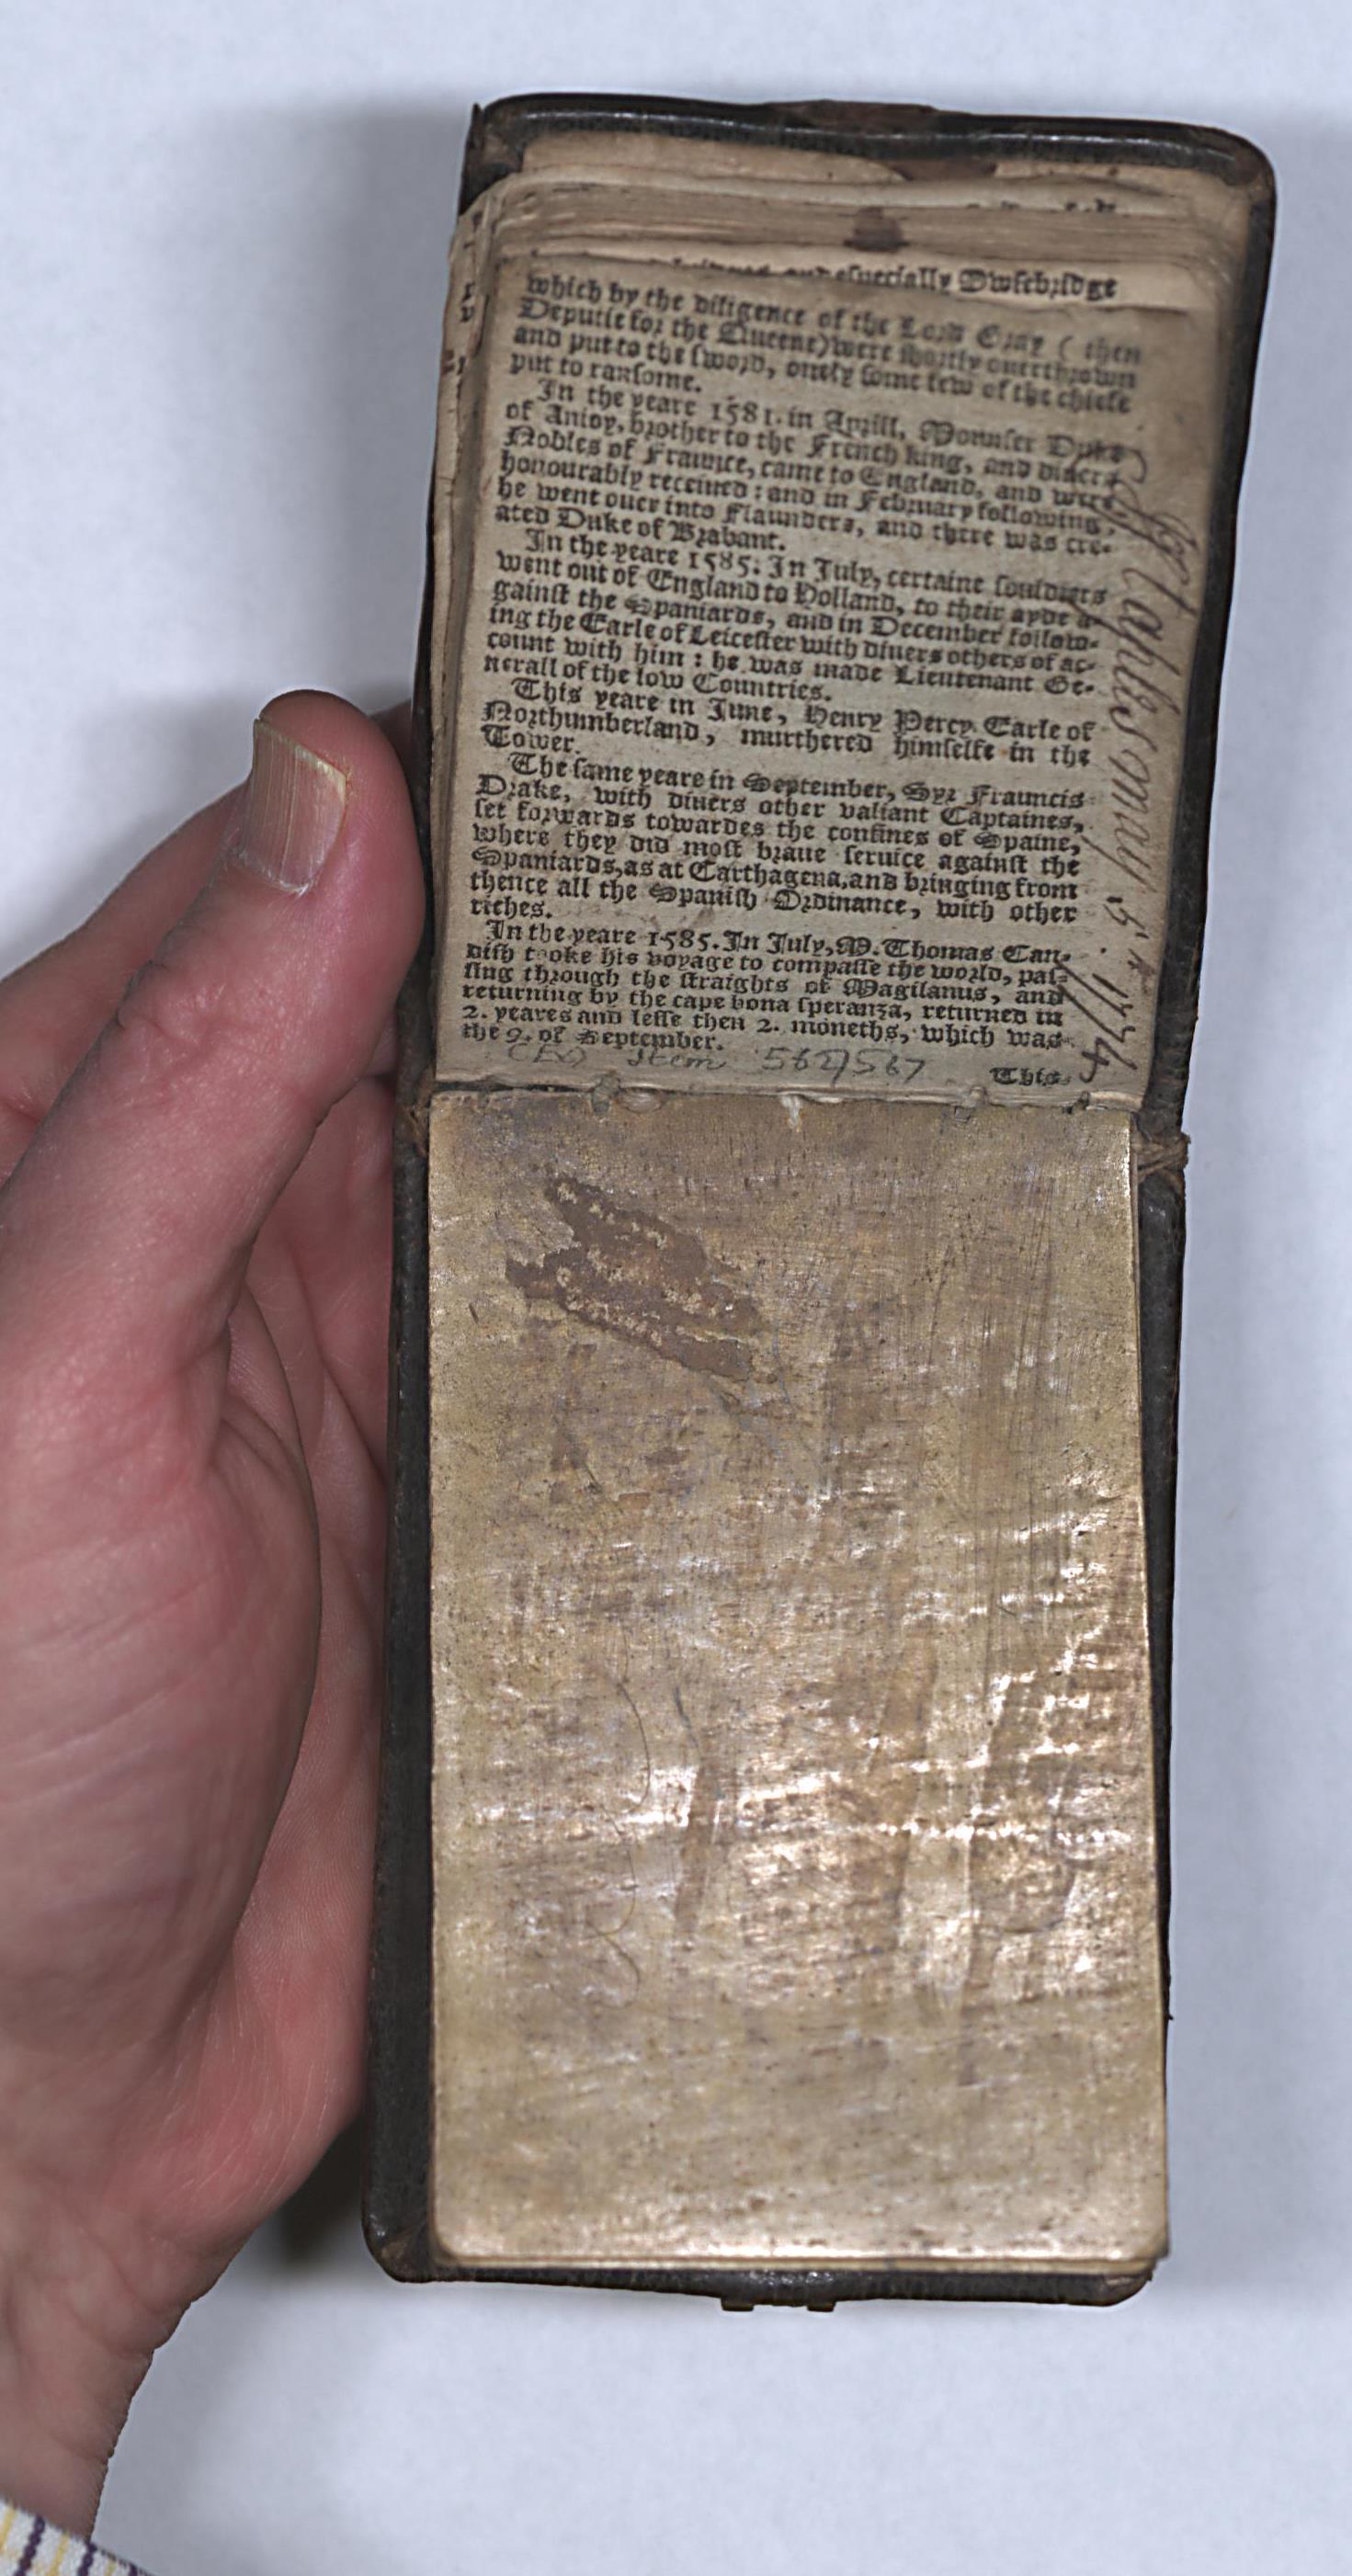 http://blogs.princeton.edu/rarebooks/images/Writing_table_9.jpg